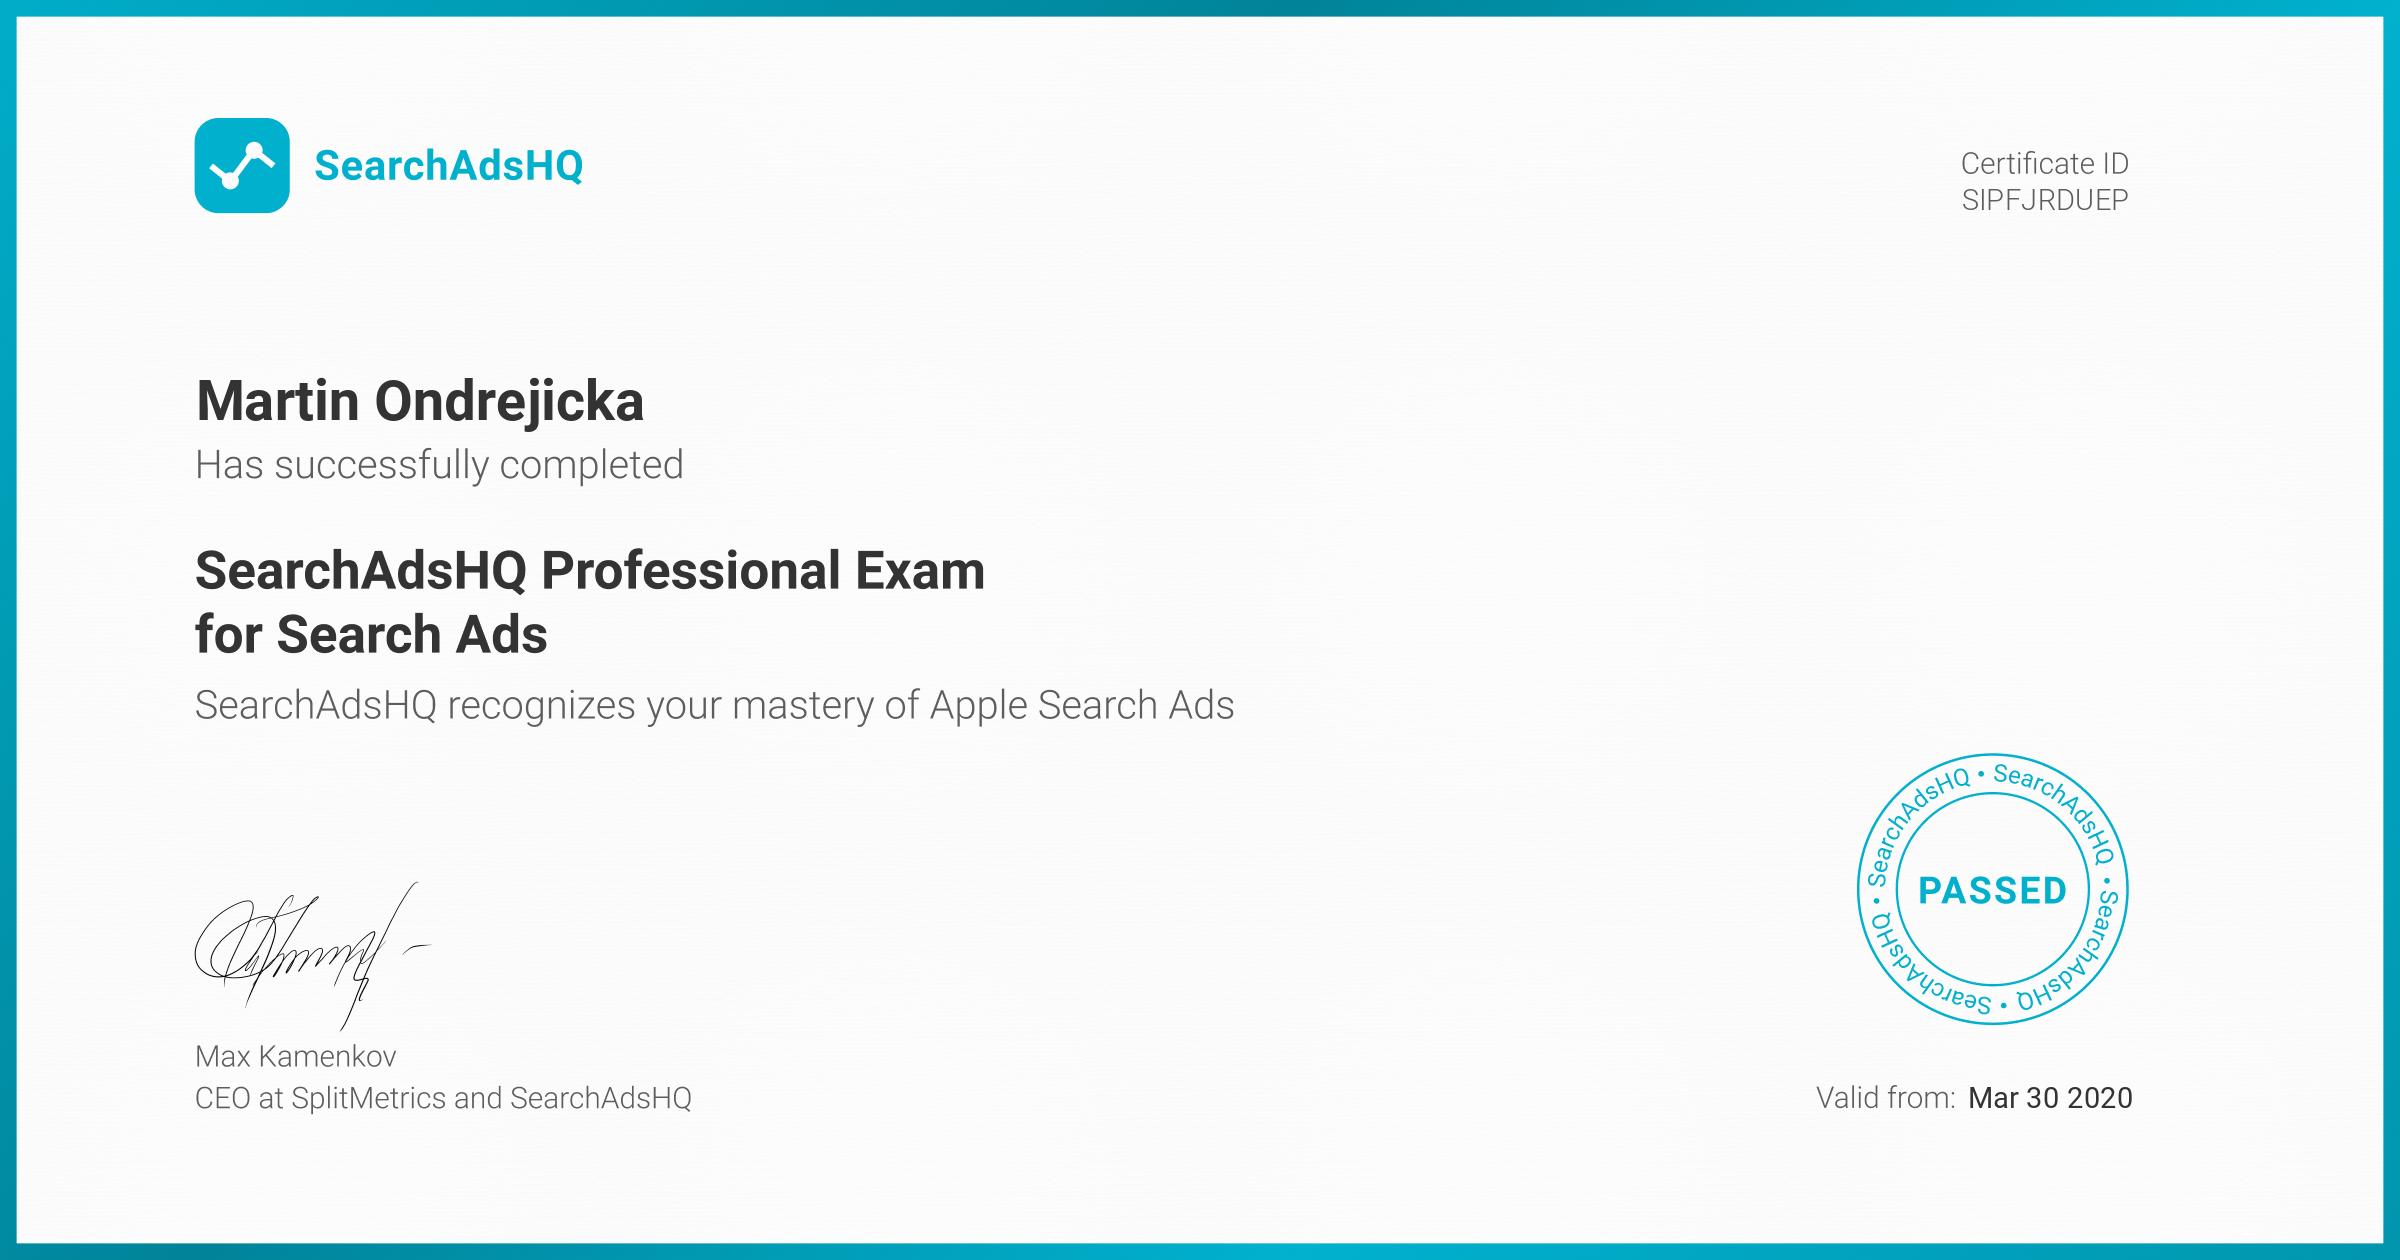 Certificate for Martin Ondrejicka   SearchAdsHQ Professional Exam for Search Ads